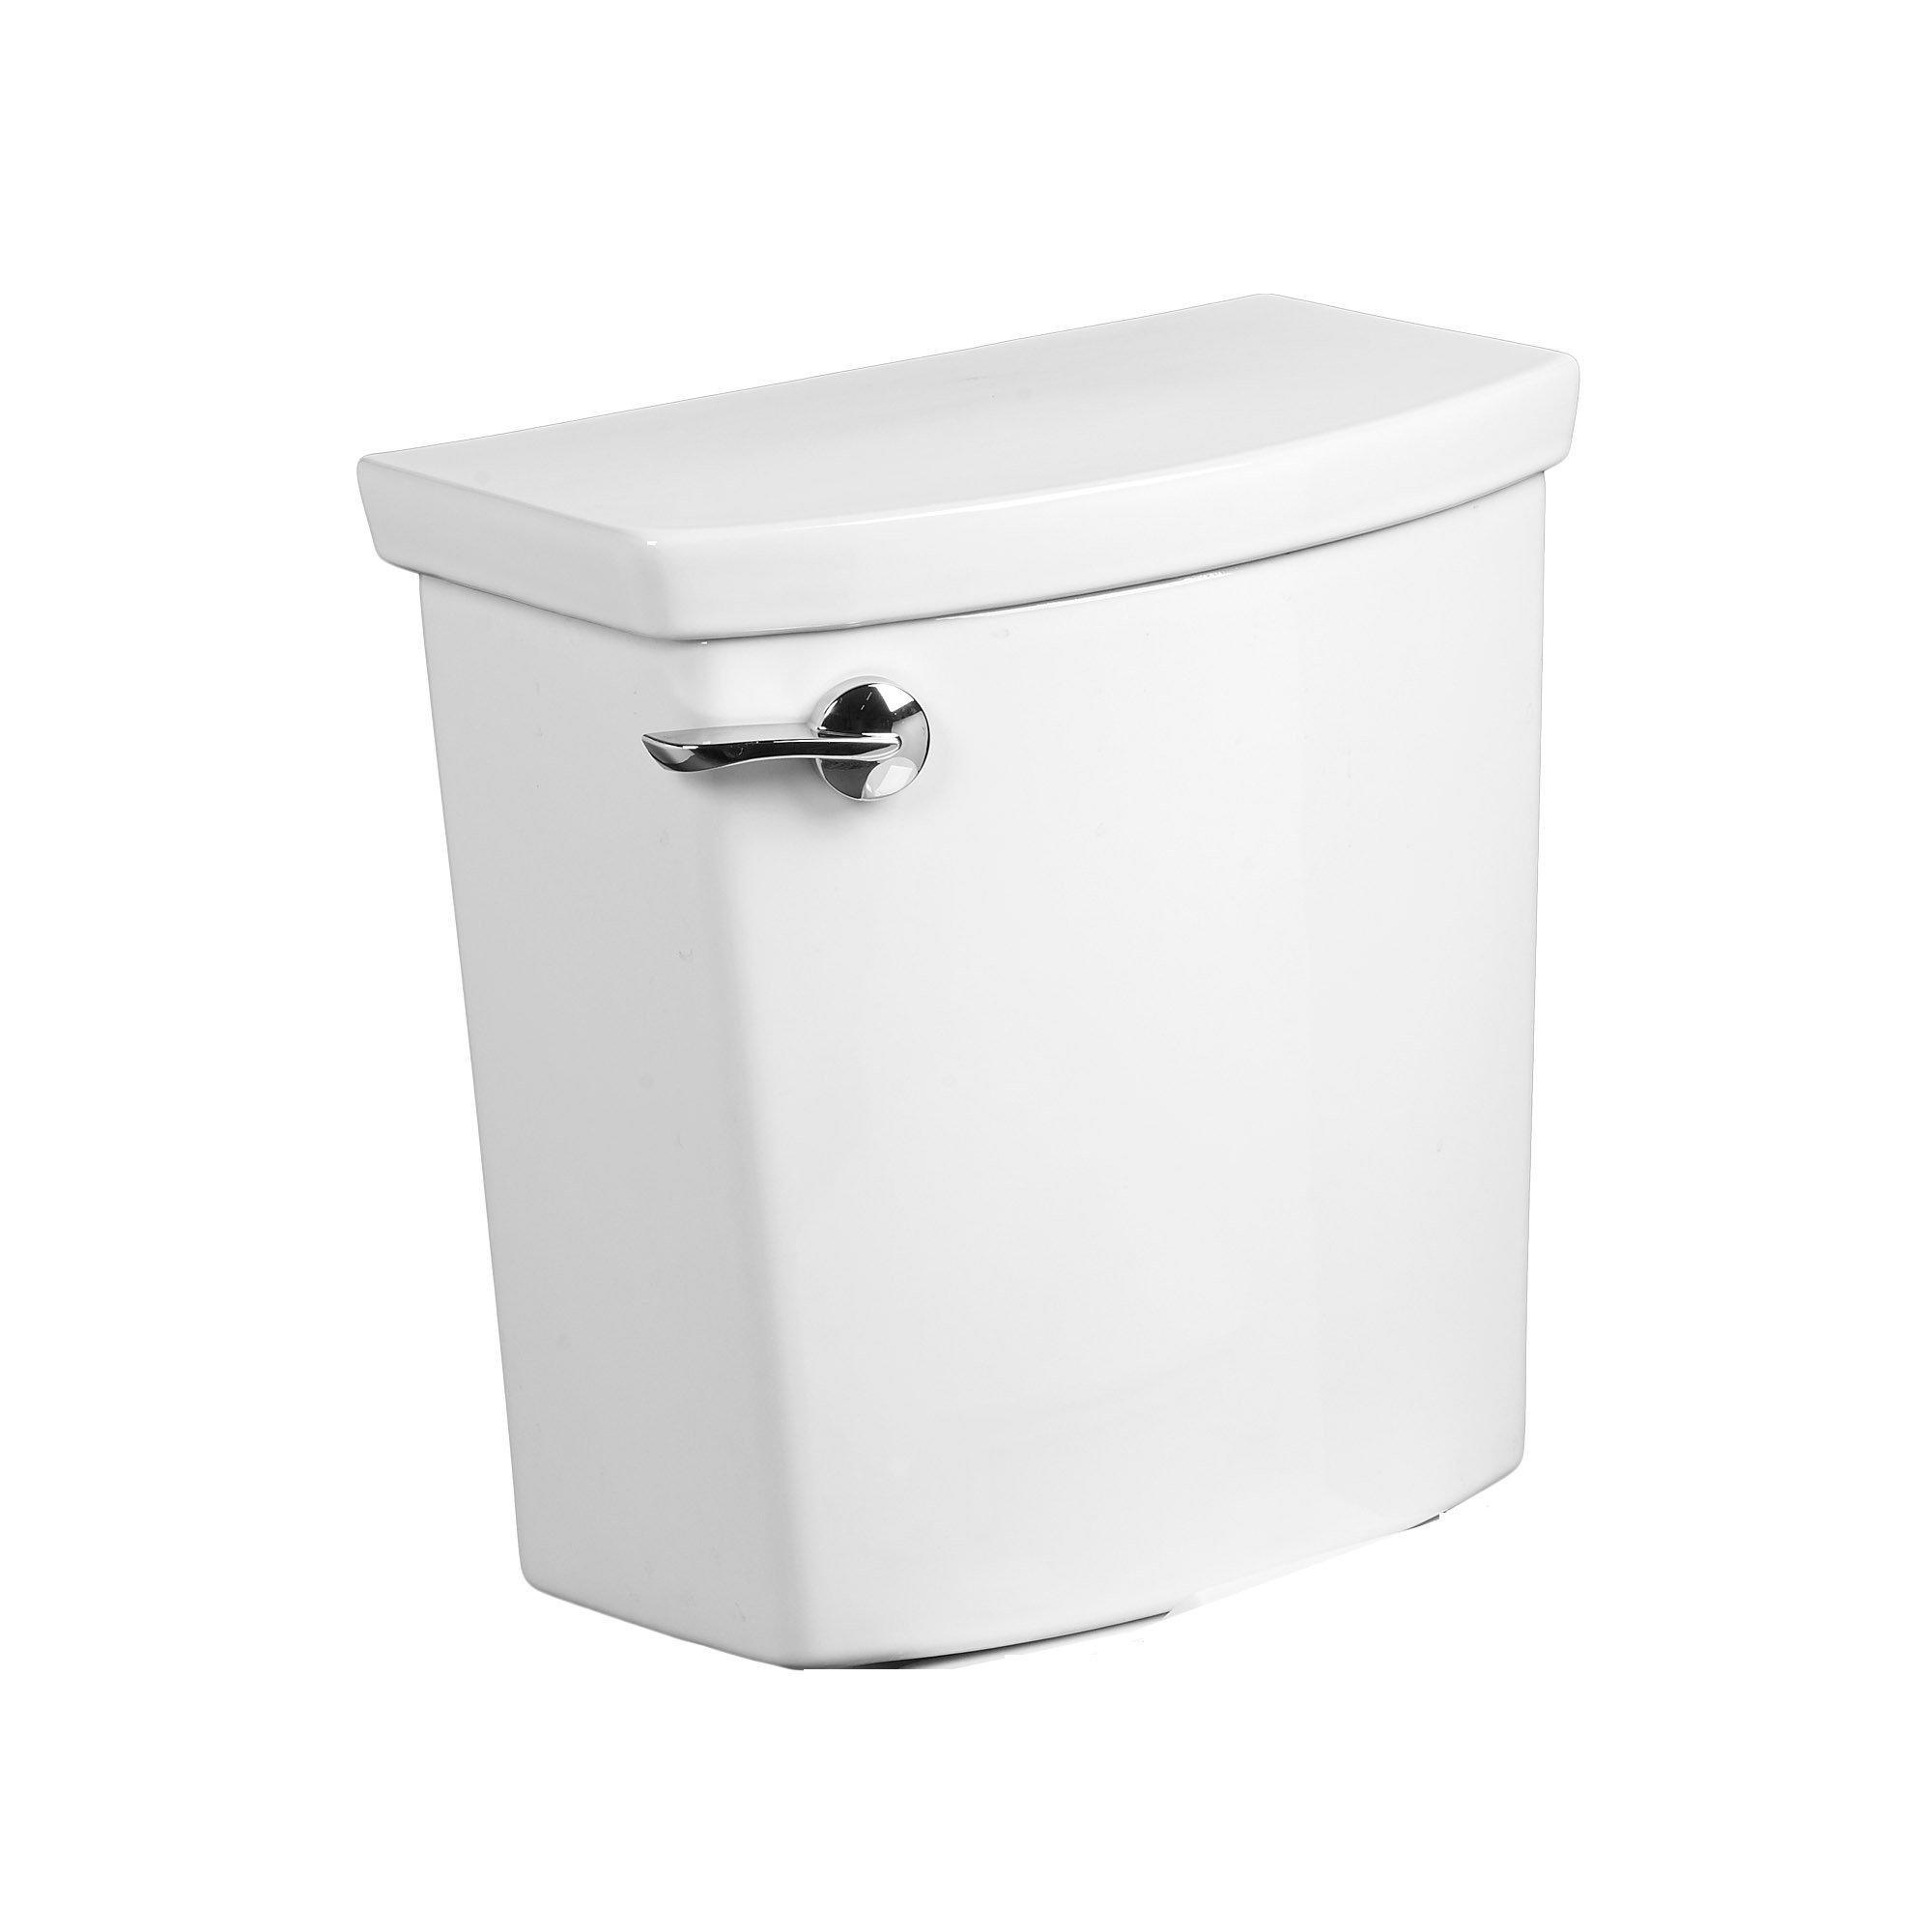 American Standard 4133A114.020 H2Optimum 12'' Rough-In Toilet Tank, White